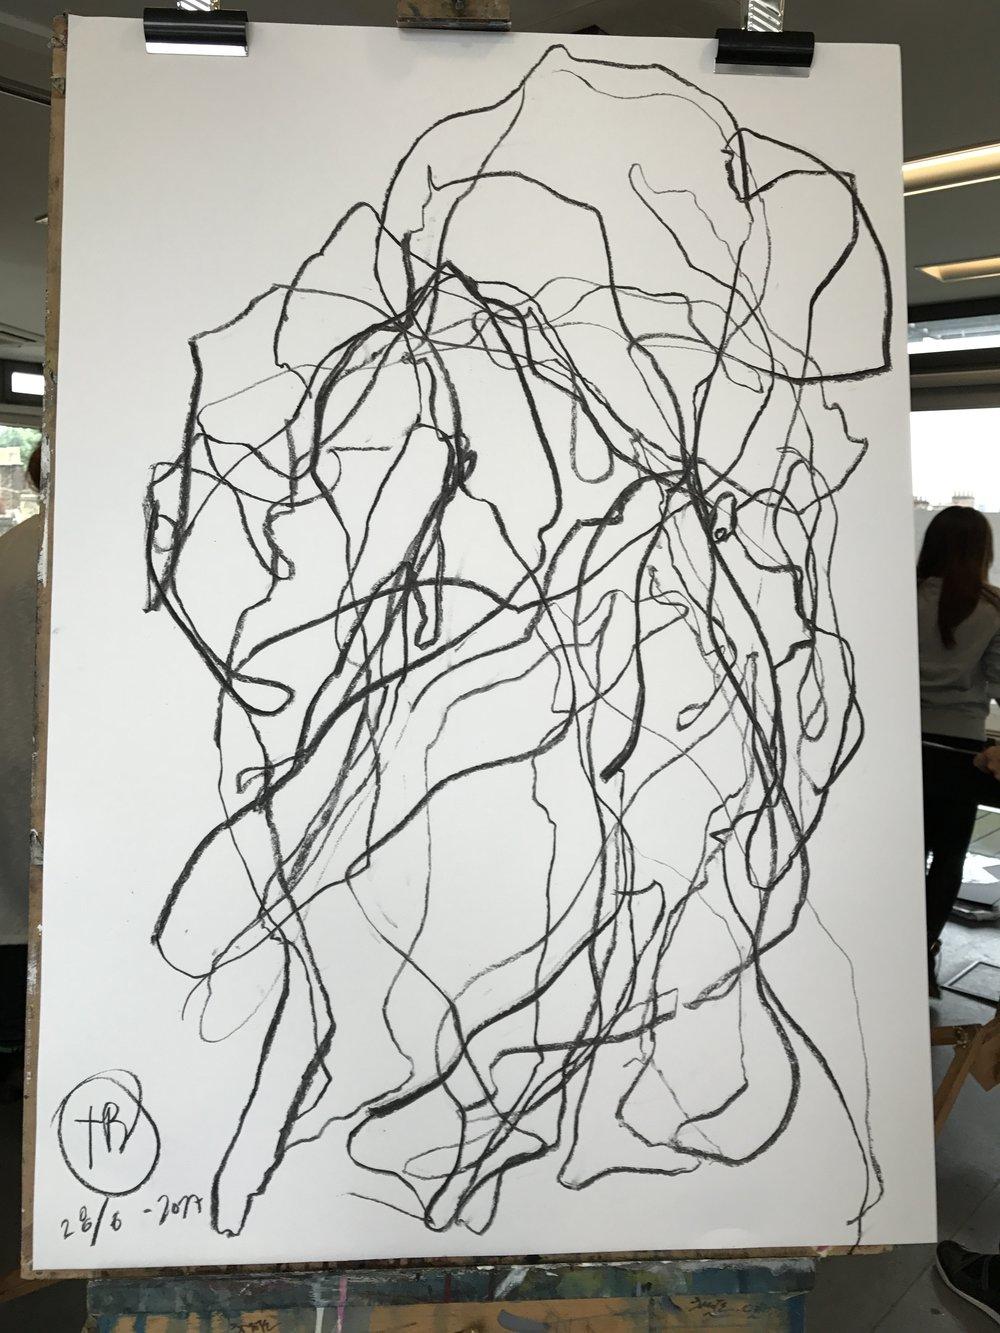 Graphite on paper.